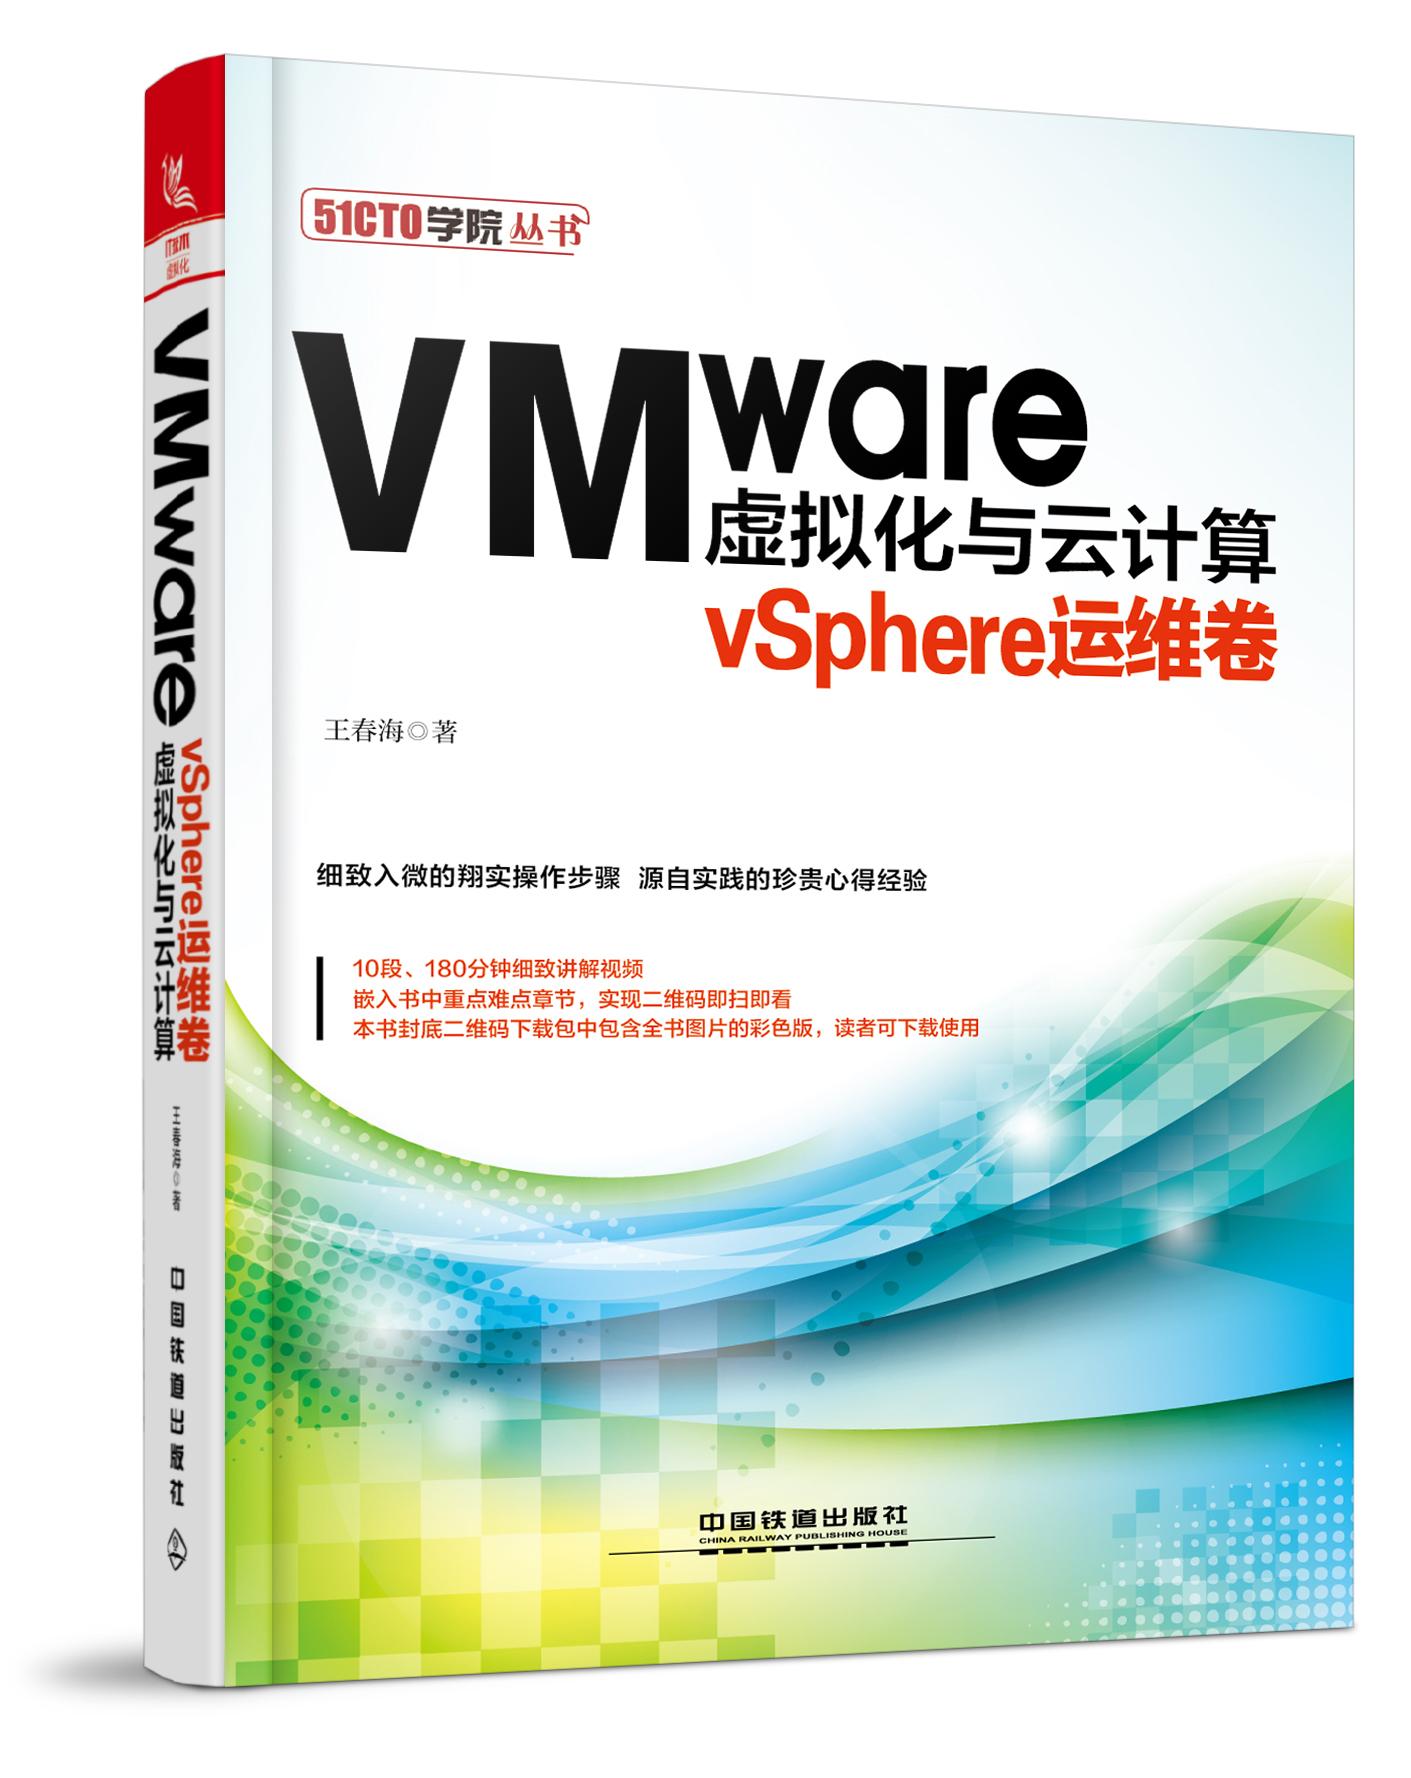 VMware虚拟化与云计算:vSphere运维卷-封面-20170906.jpg